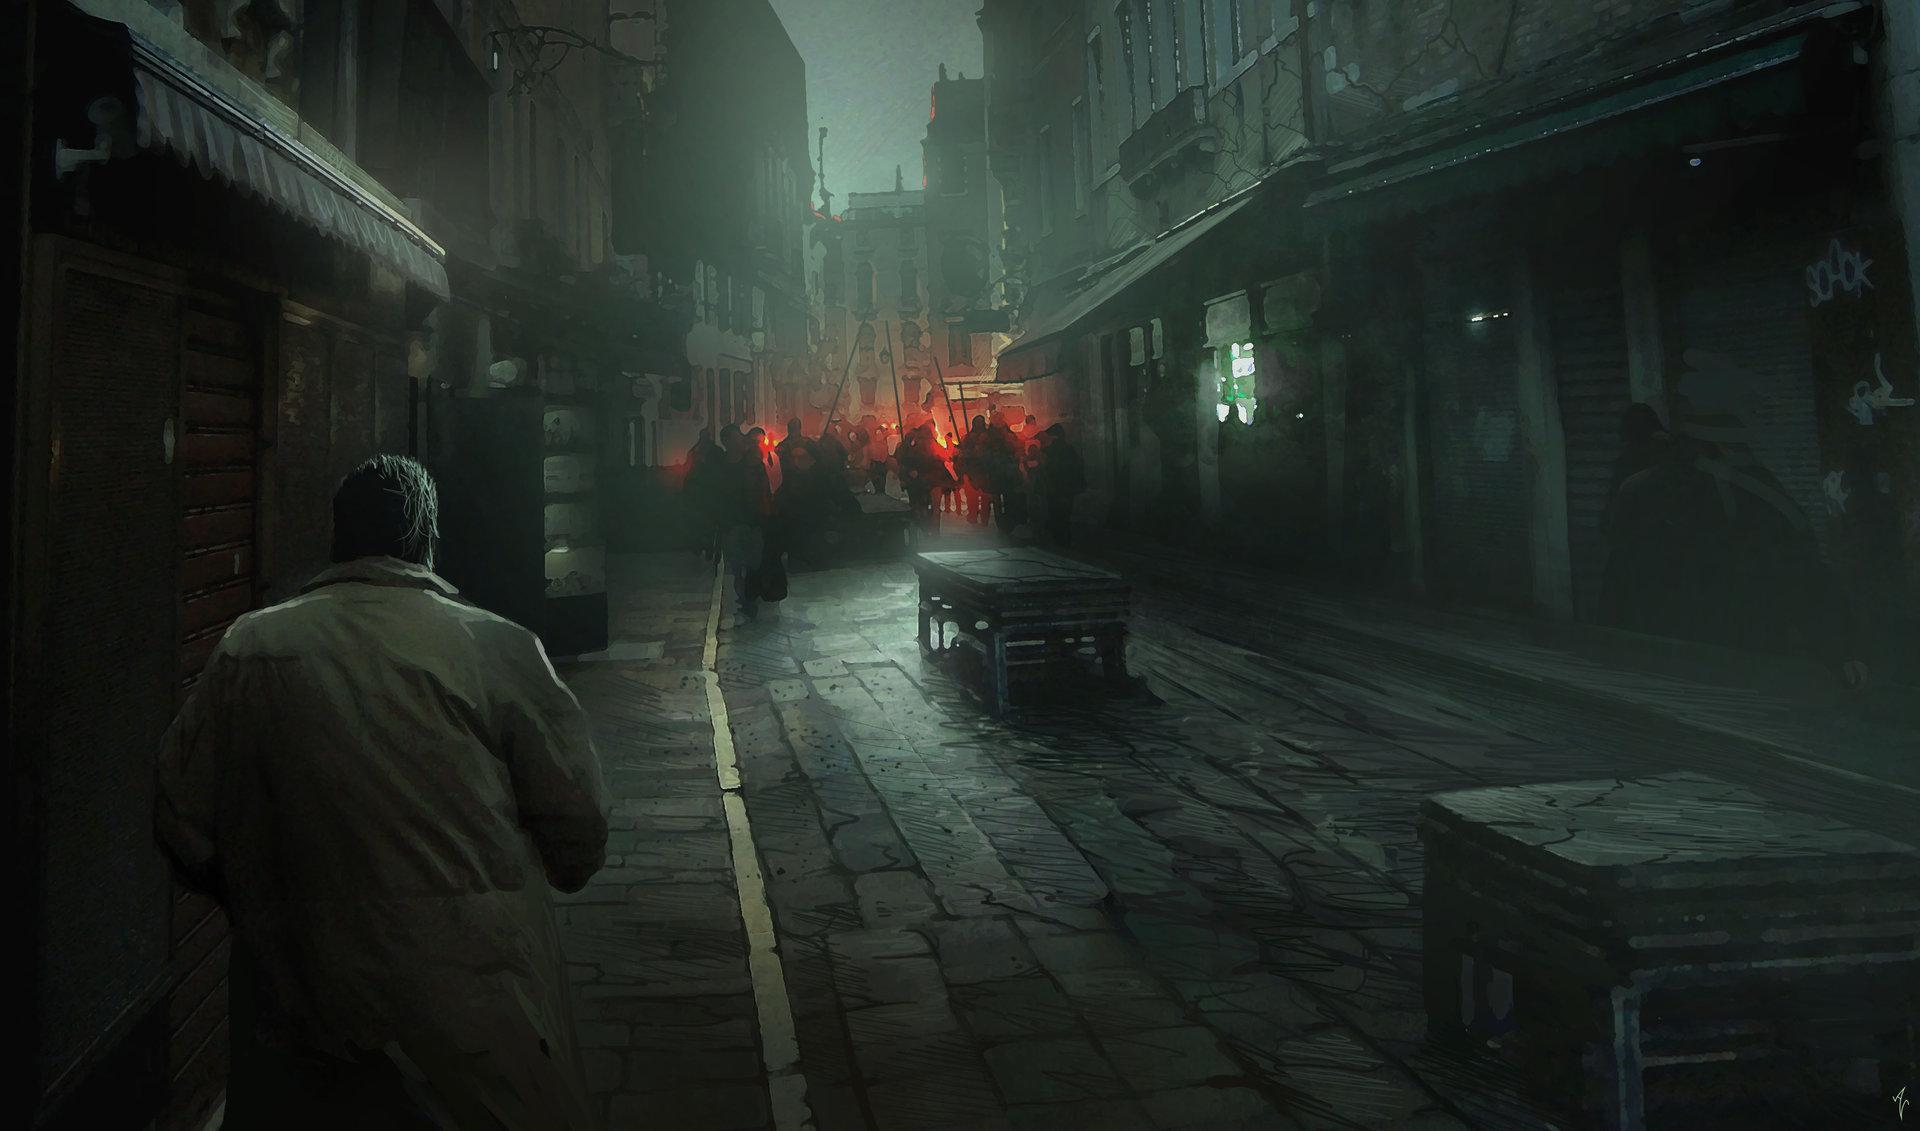 cyberpunk city hd wallpapers - photo #31